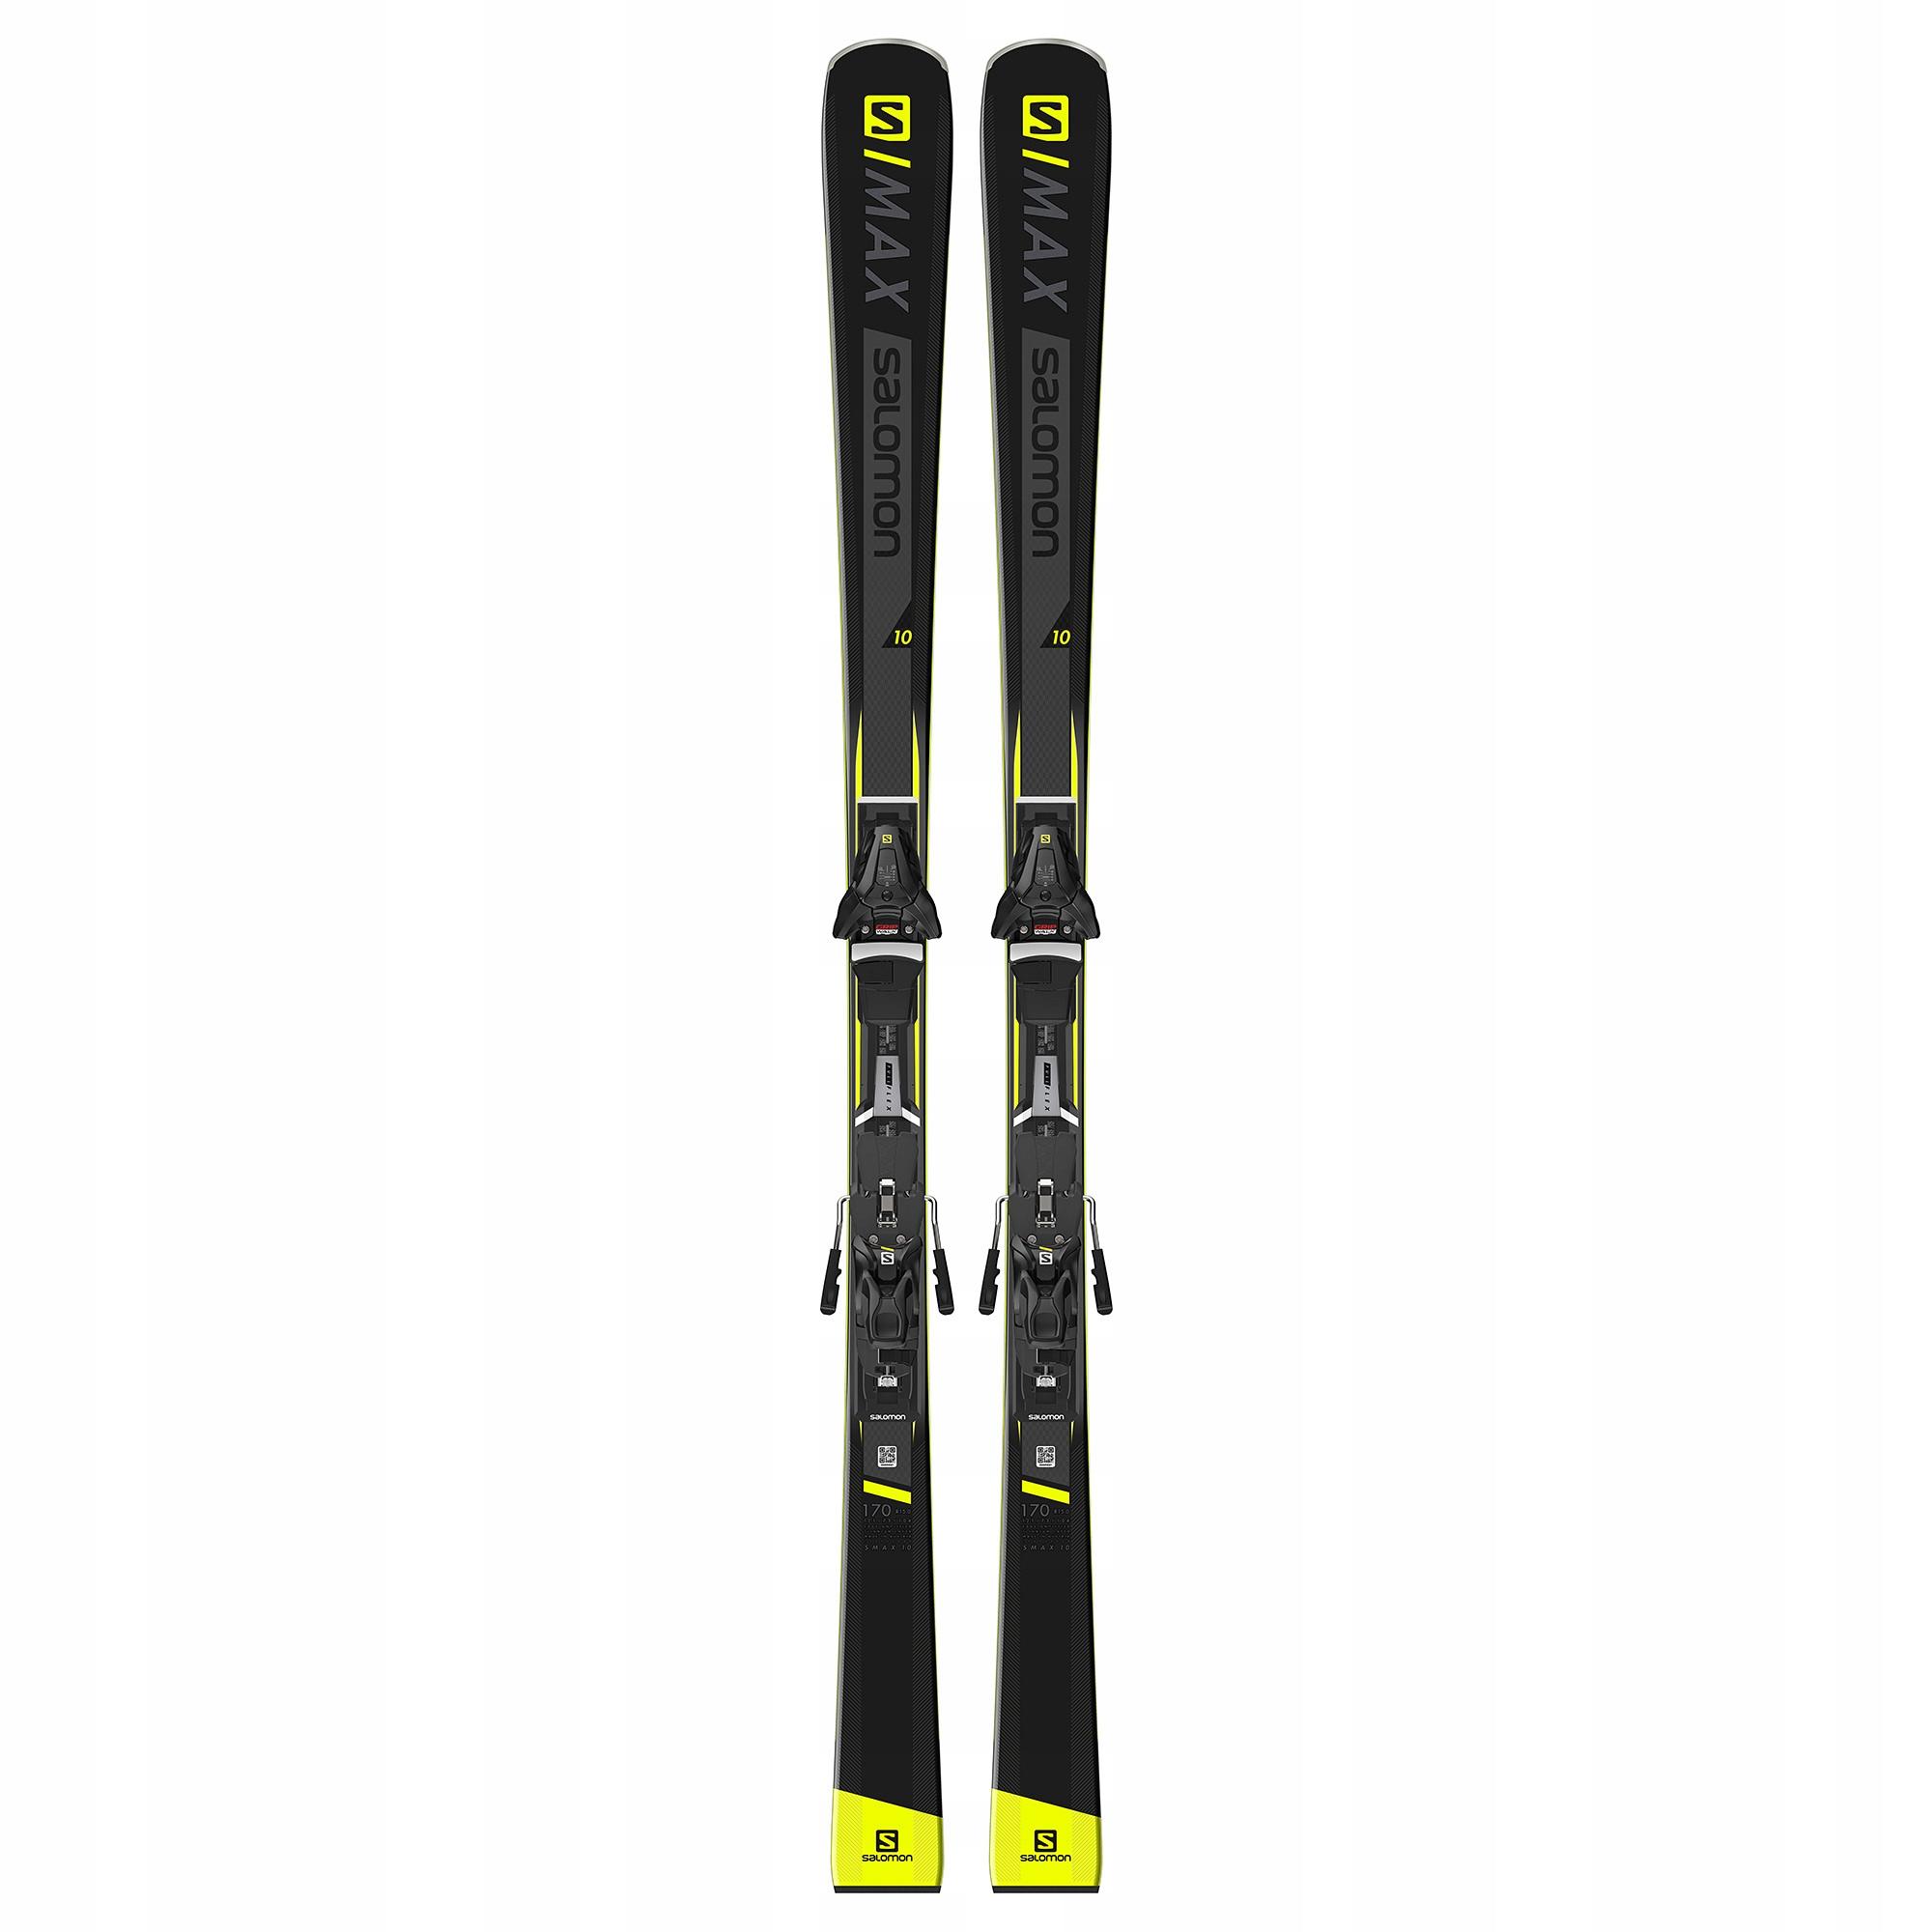 Narty skitourowe SALOMON SLAB X ALP 158cm 201819